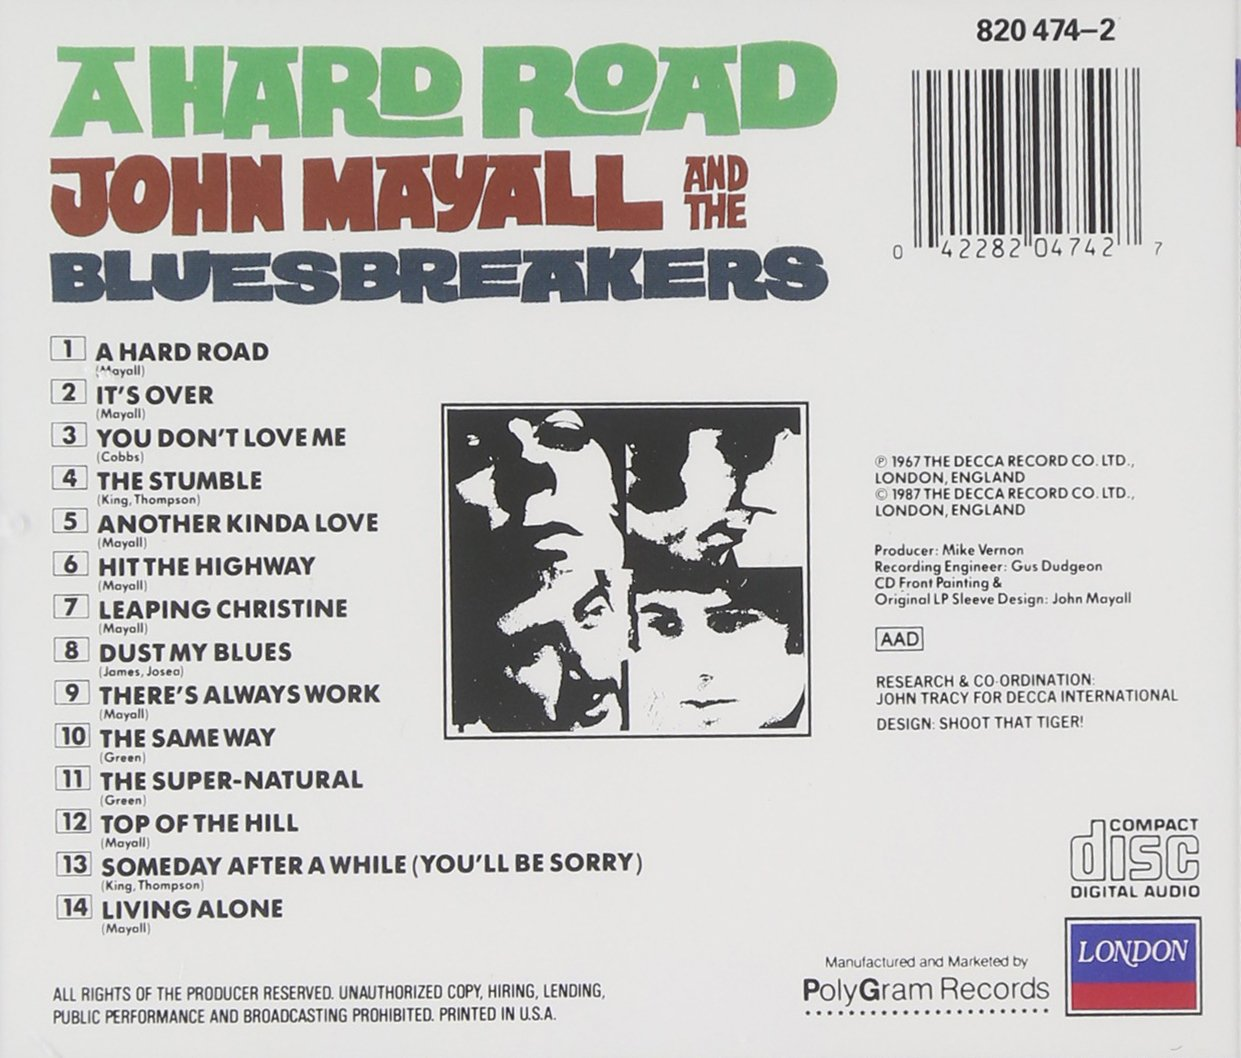 John Mayall and the Bluesbreakers - A Hard Road - Amazon.com Music